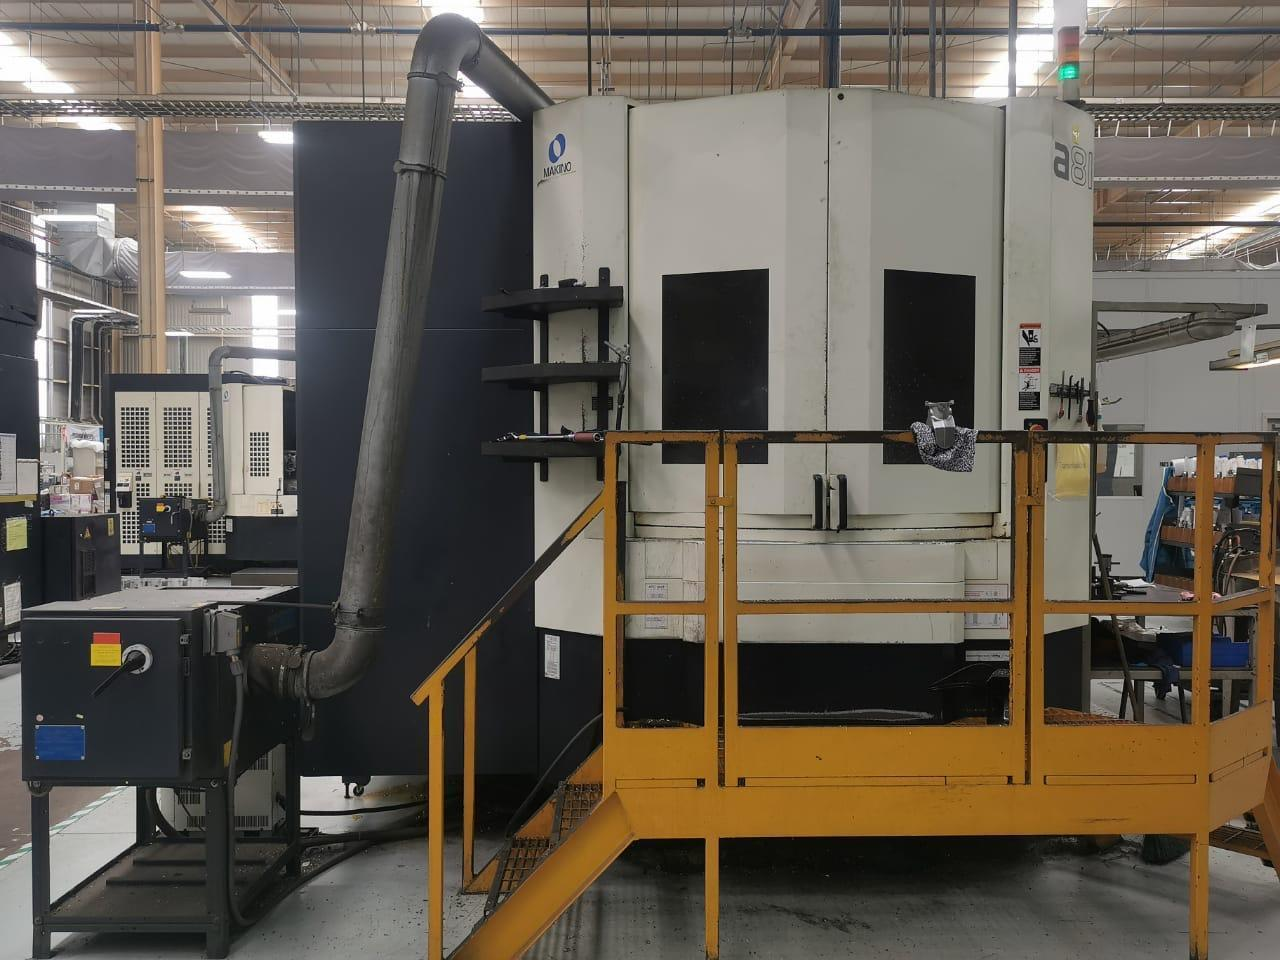 Makino a81 CNC Horizontal Machining Center